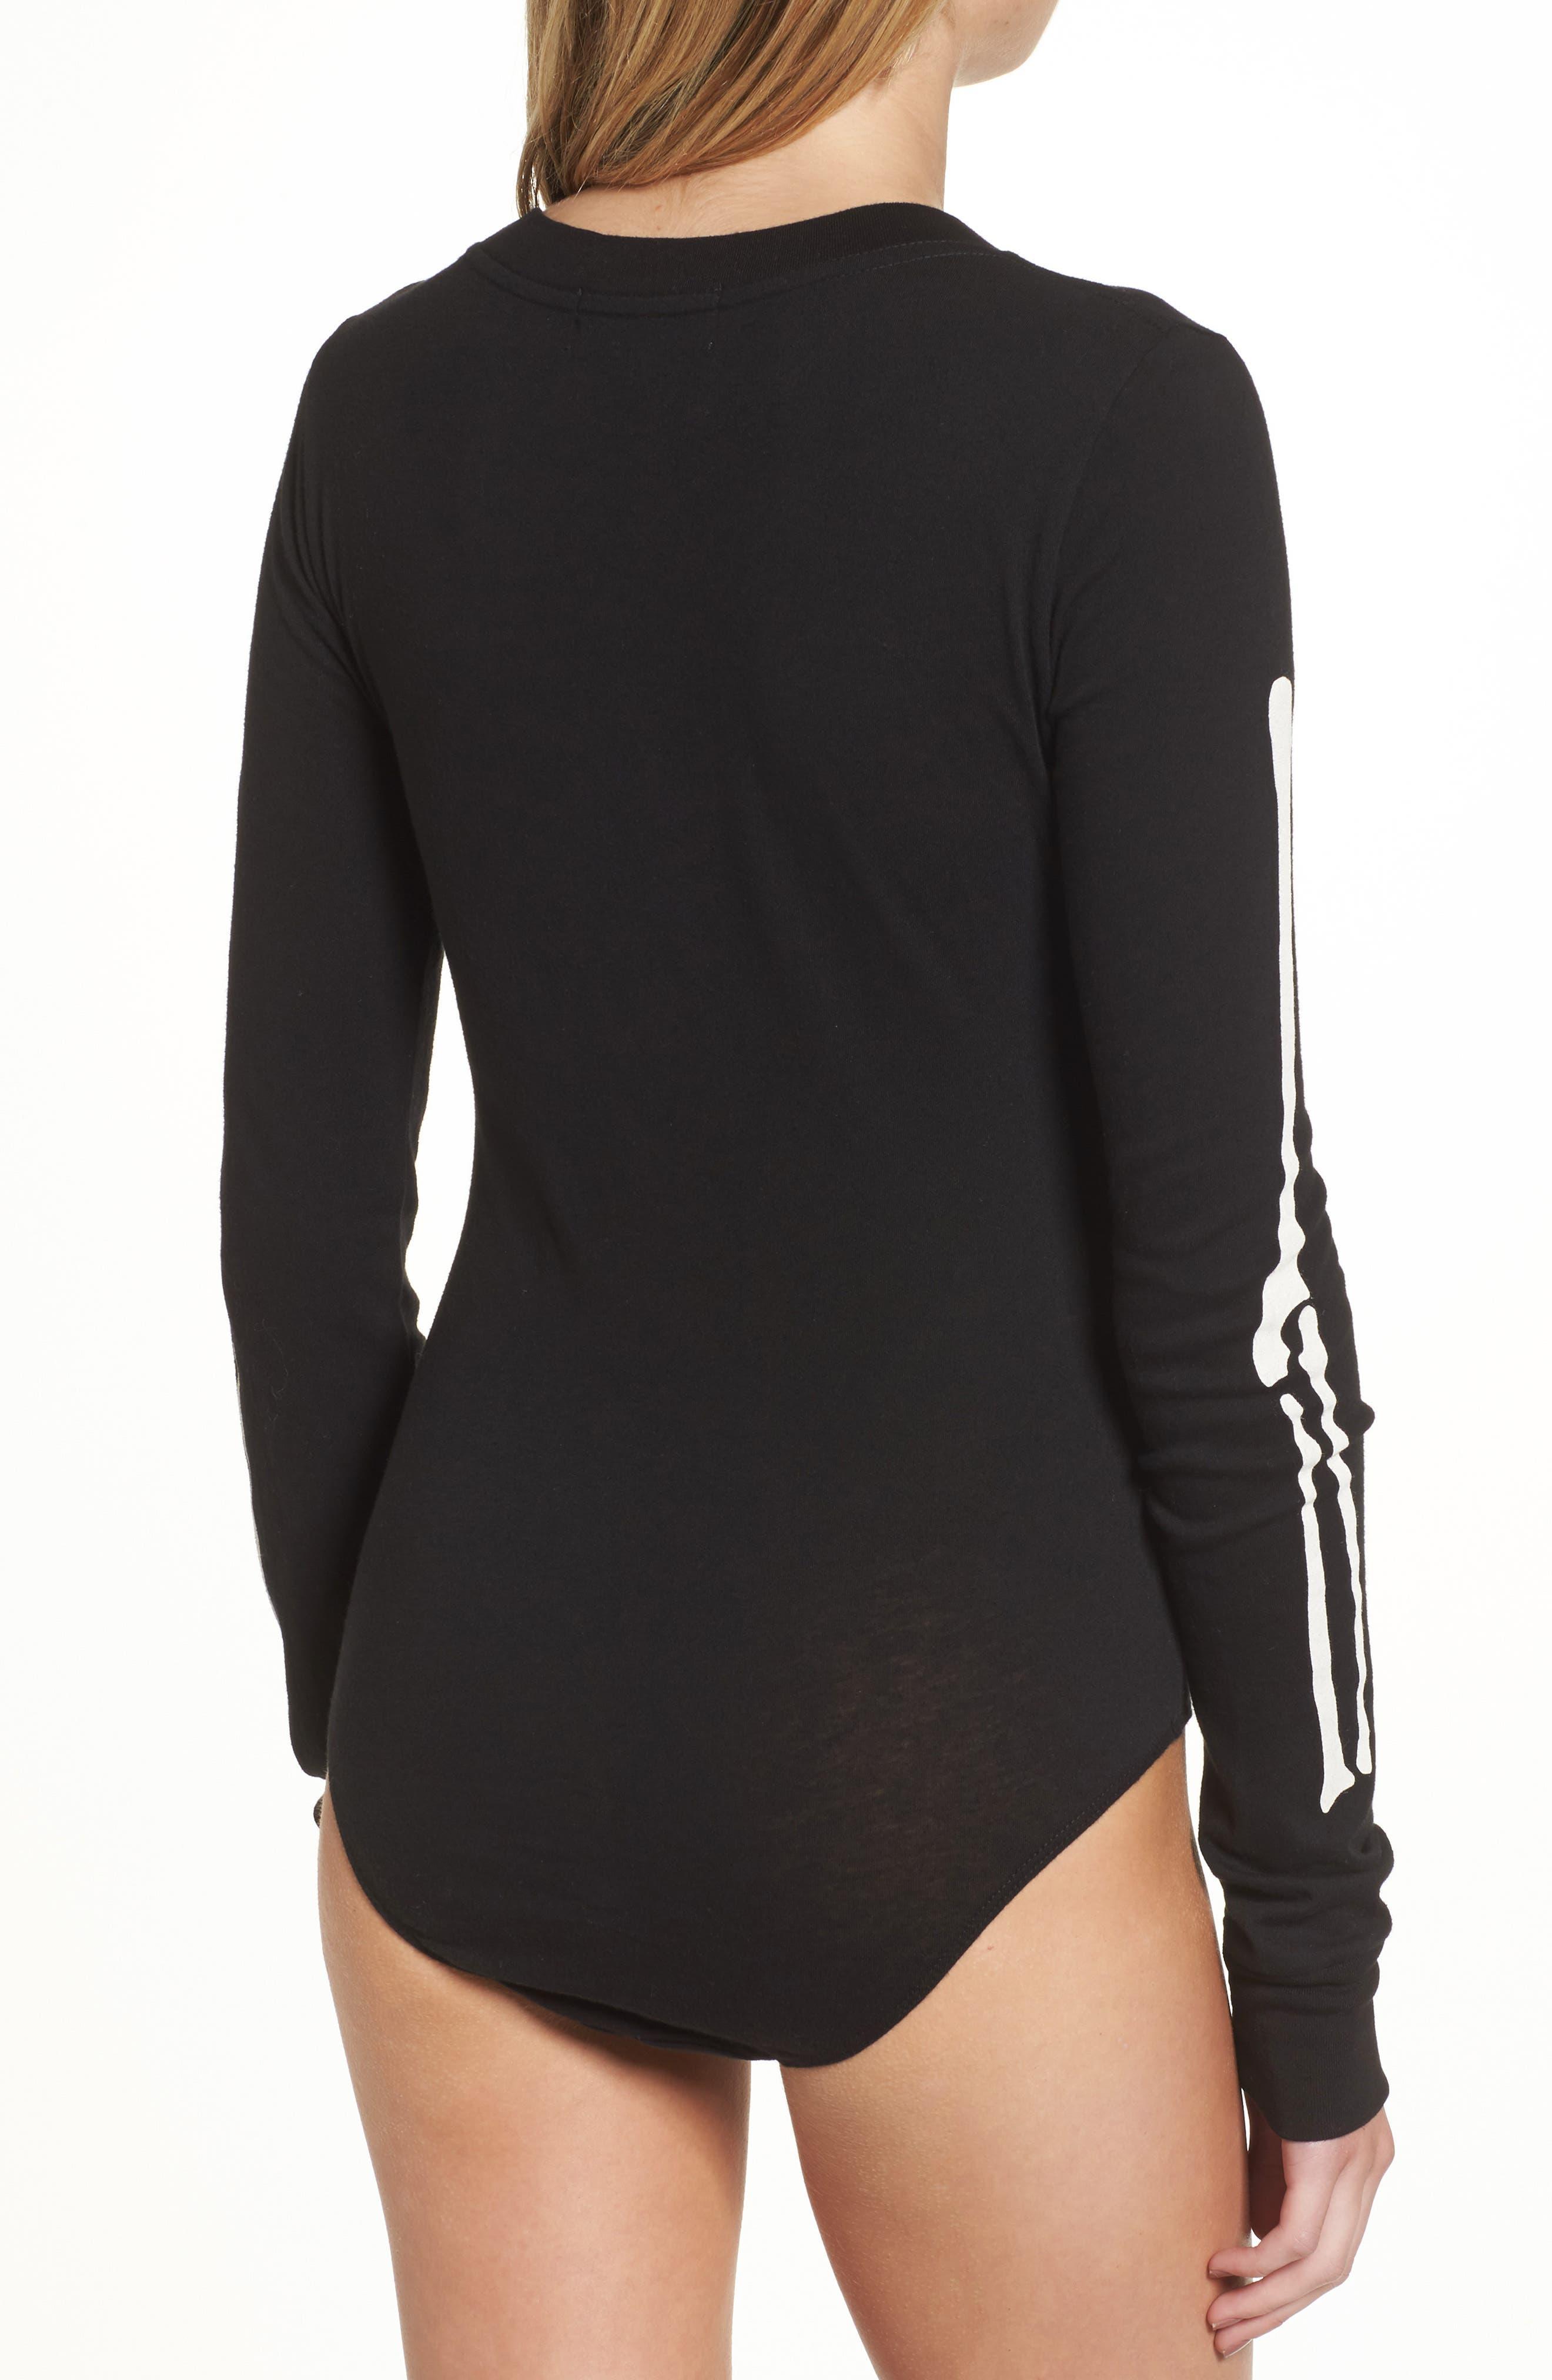 X-Ray Vision Bodysuit,                             Alternate thumbnail 3, color,                             Black